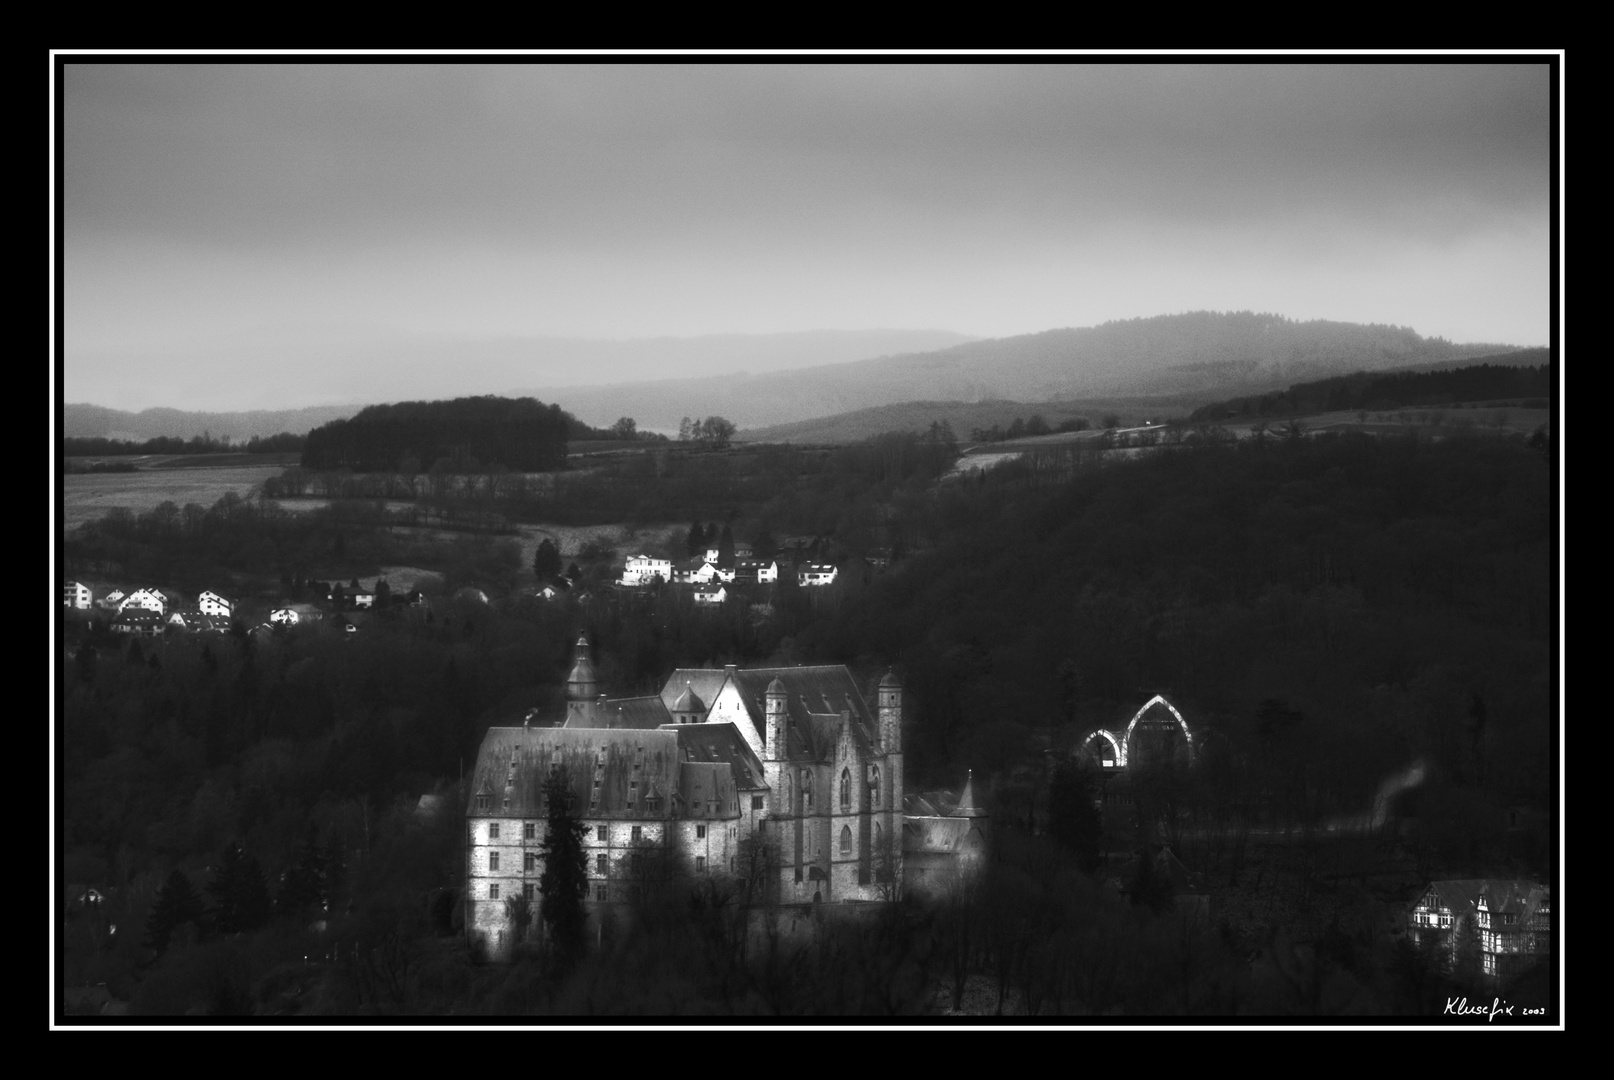 Marburger-Schloss